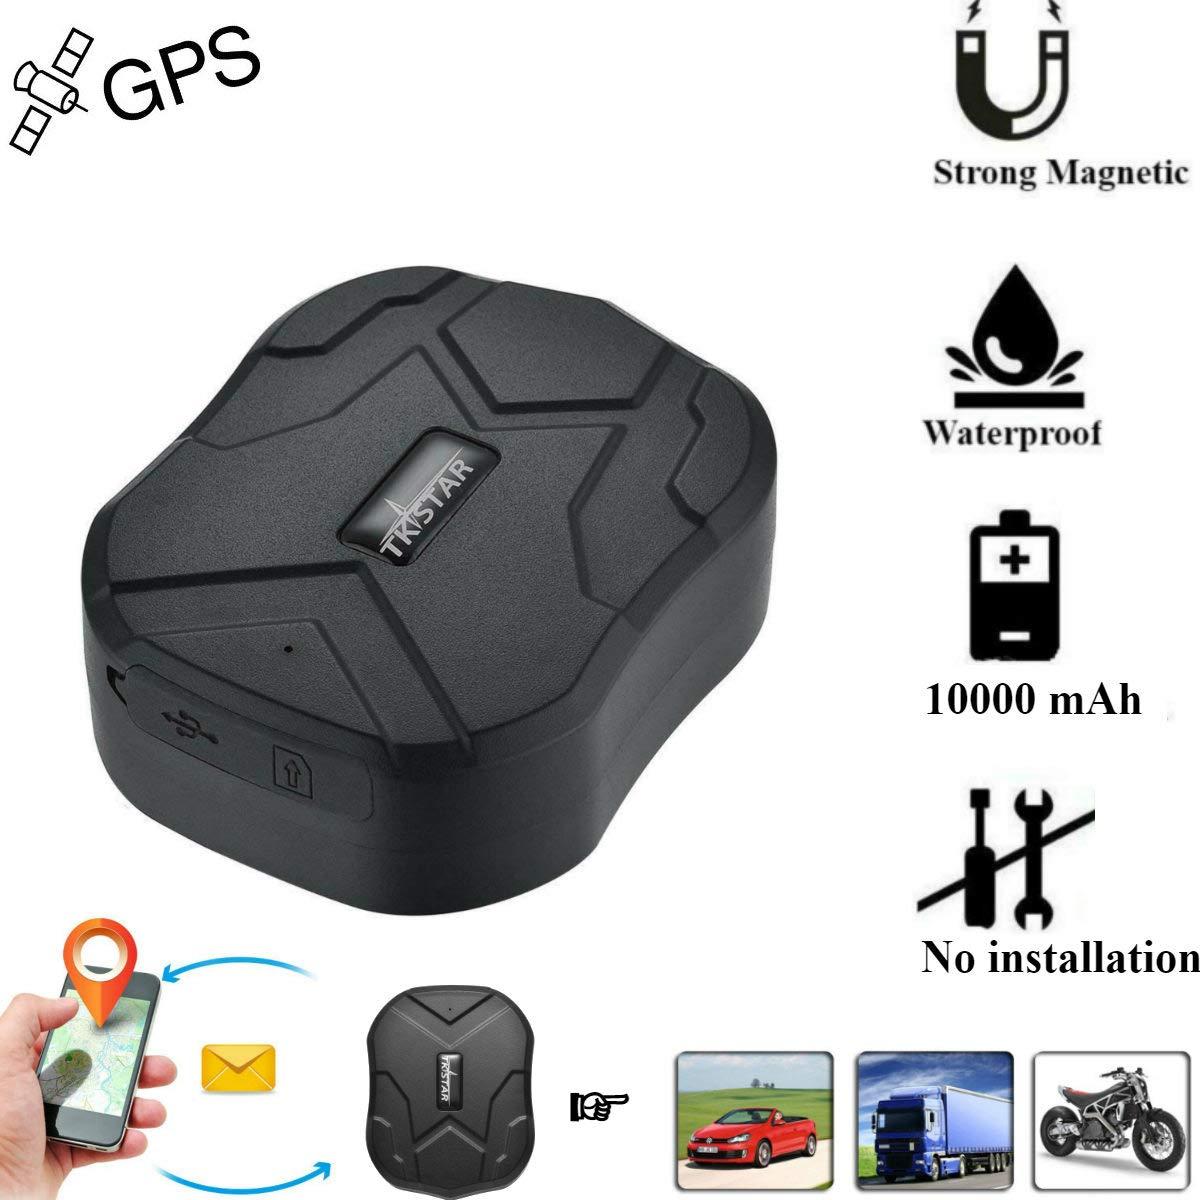 TKSTAR GPS Tracker TK905B Localizador GPS Coche 150 Días de Reposo-Localizador GPS Antirrobo para Vehículo Camión Moto: Amazon.es: Electrónica